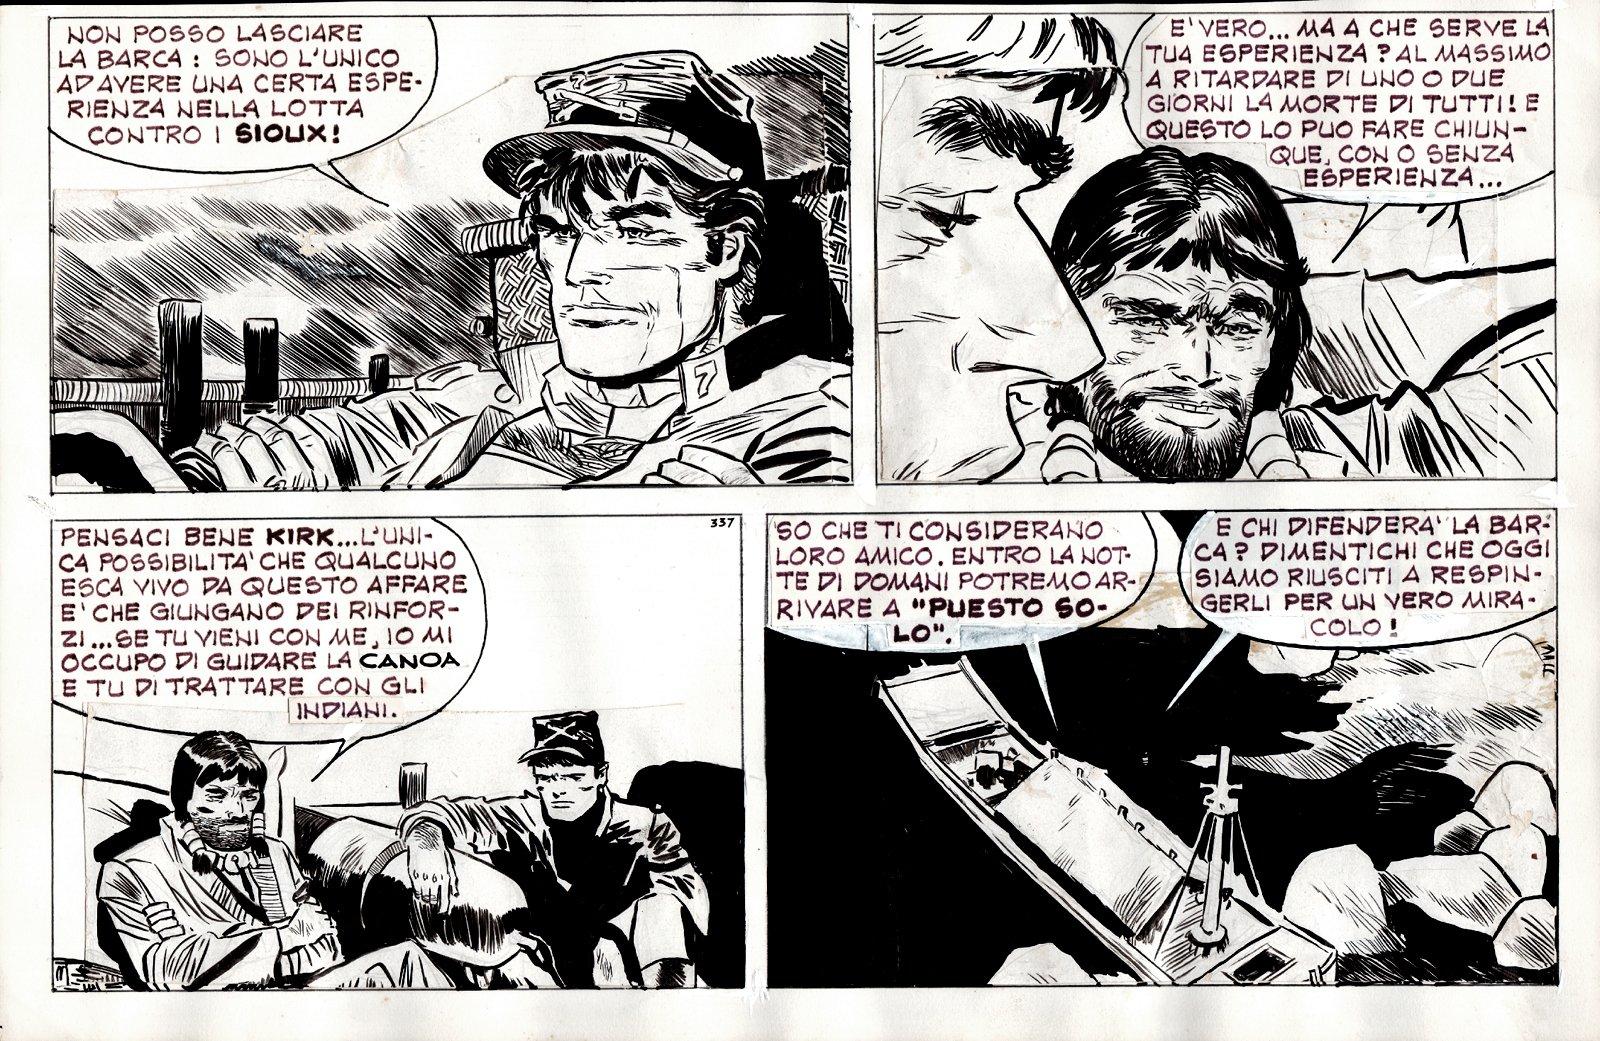 Sgt. Kirk Strip Art (1954)